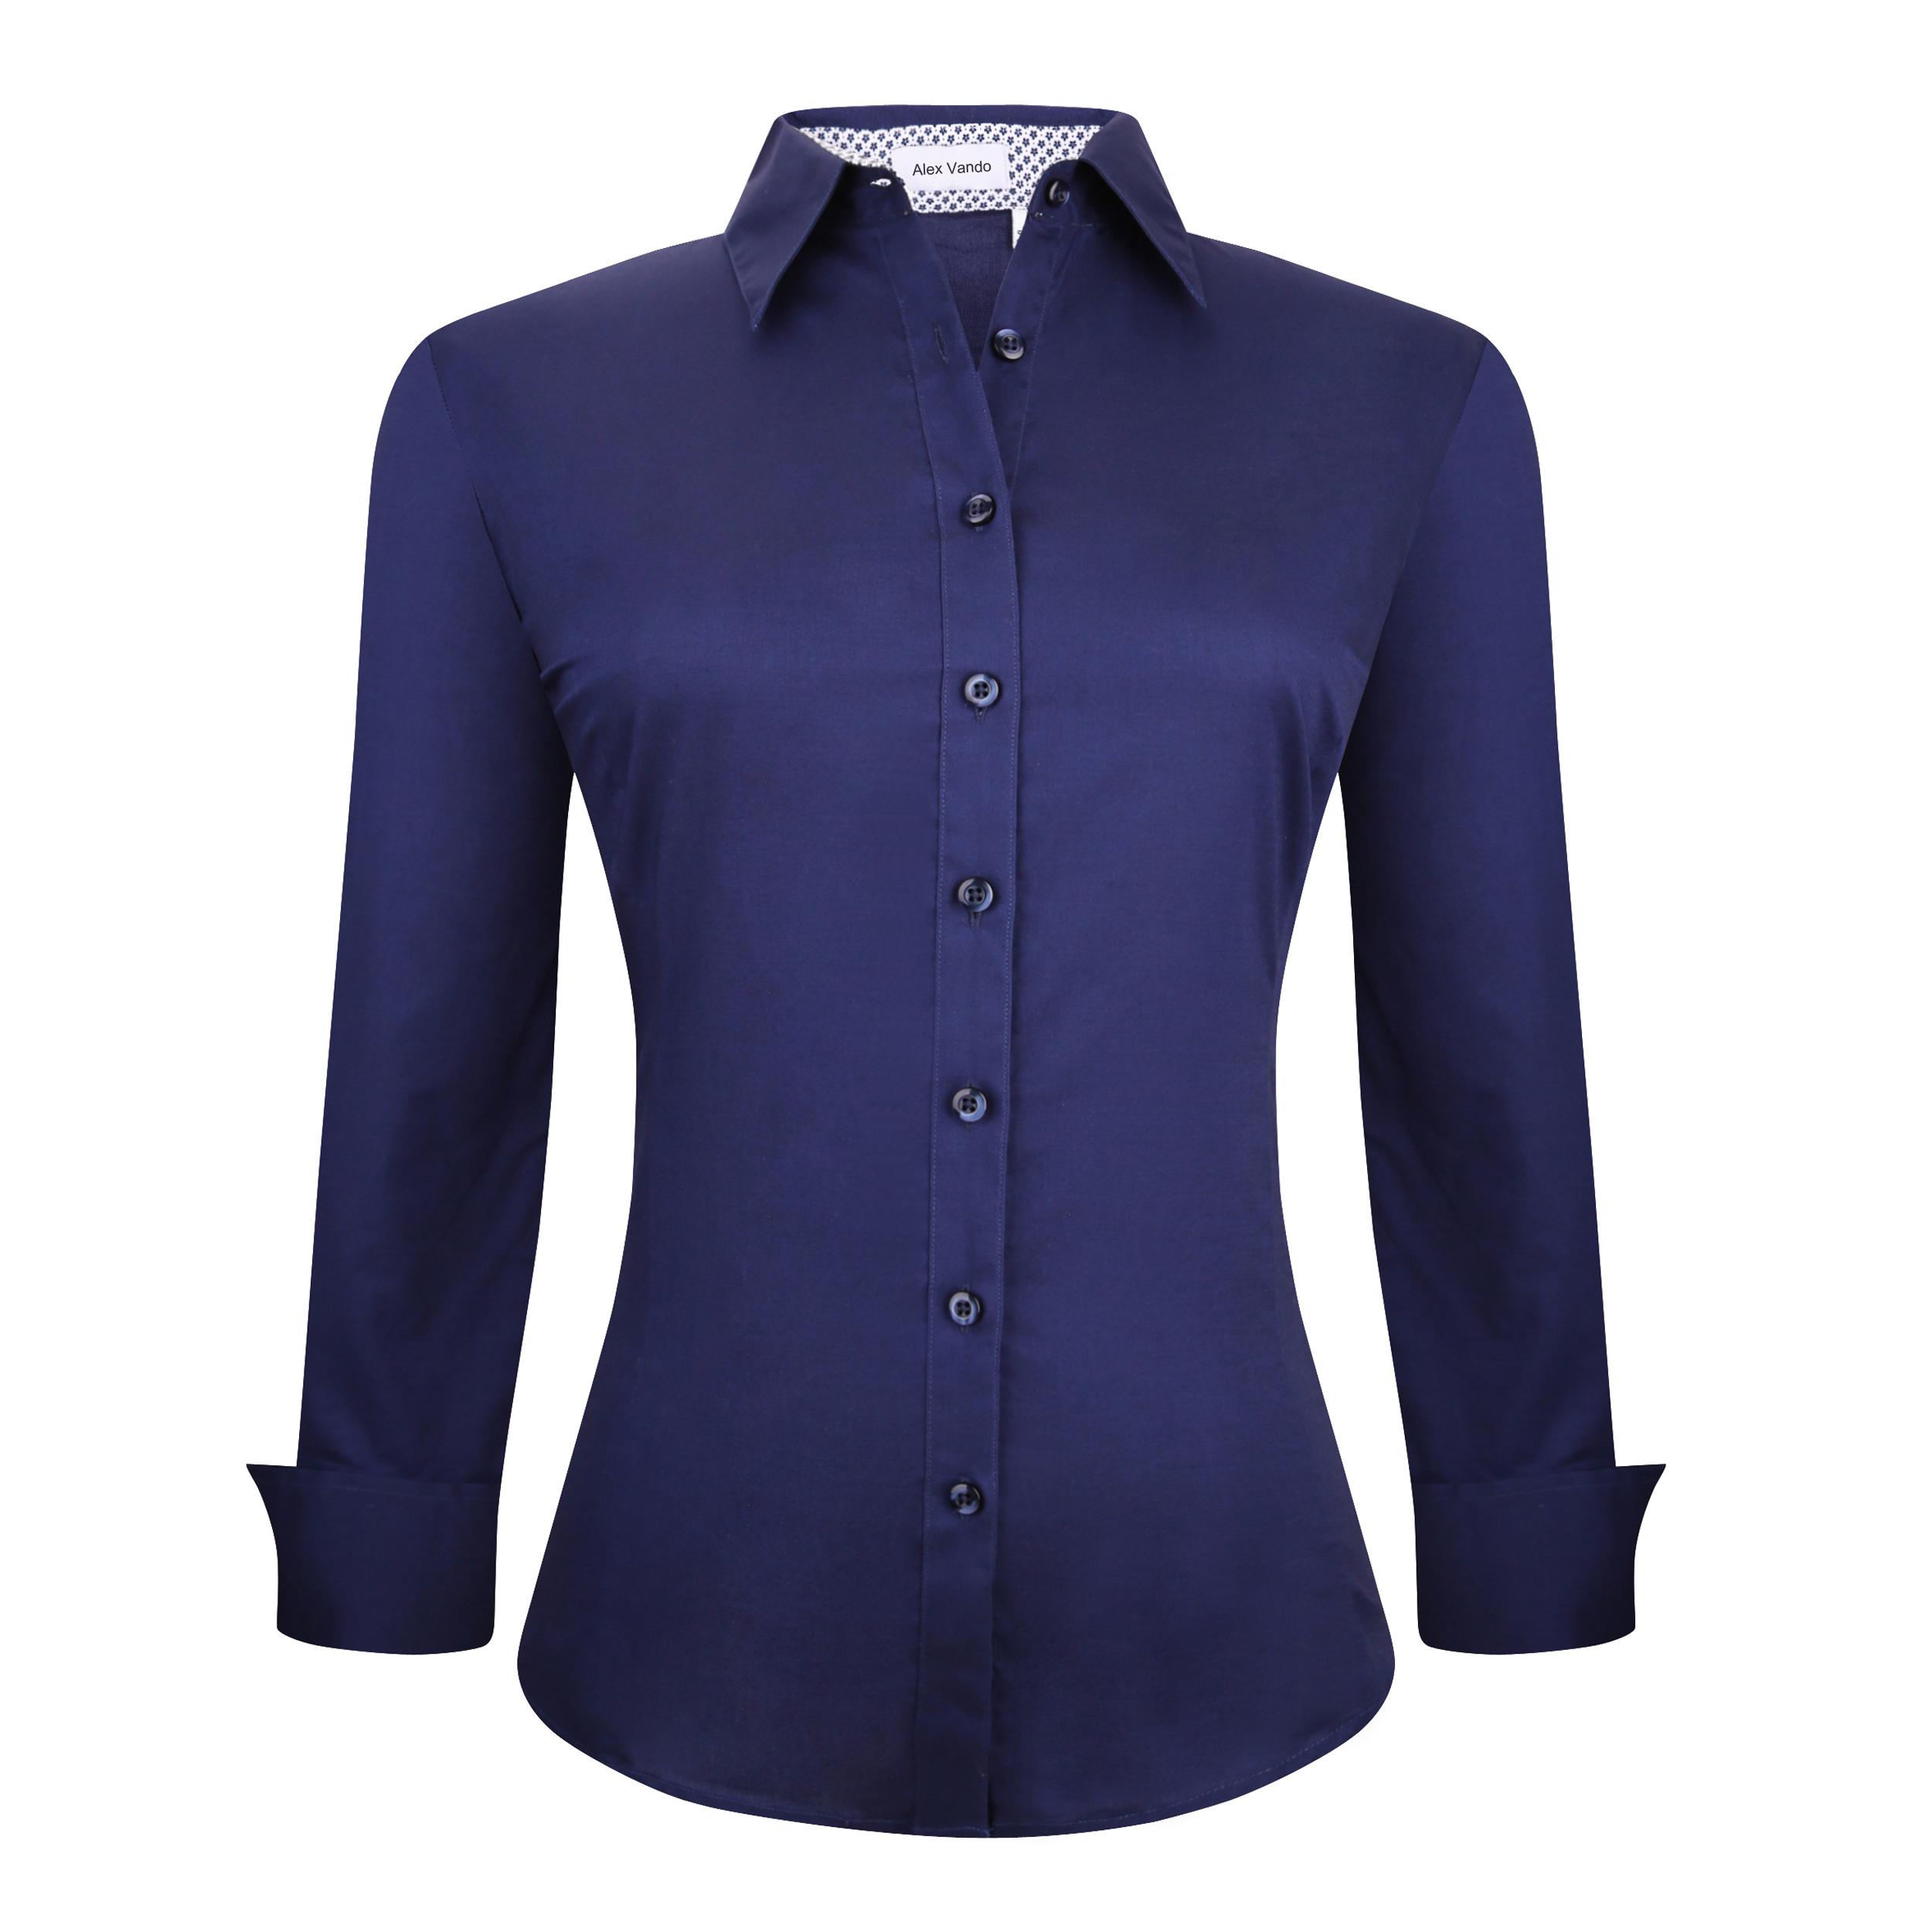 Womens Dress Shirts Cotton Casual Regular Fit Long Sleeve Collar ...